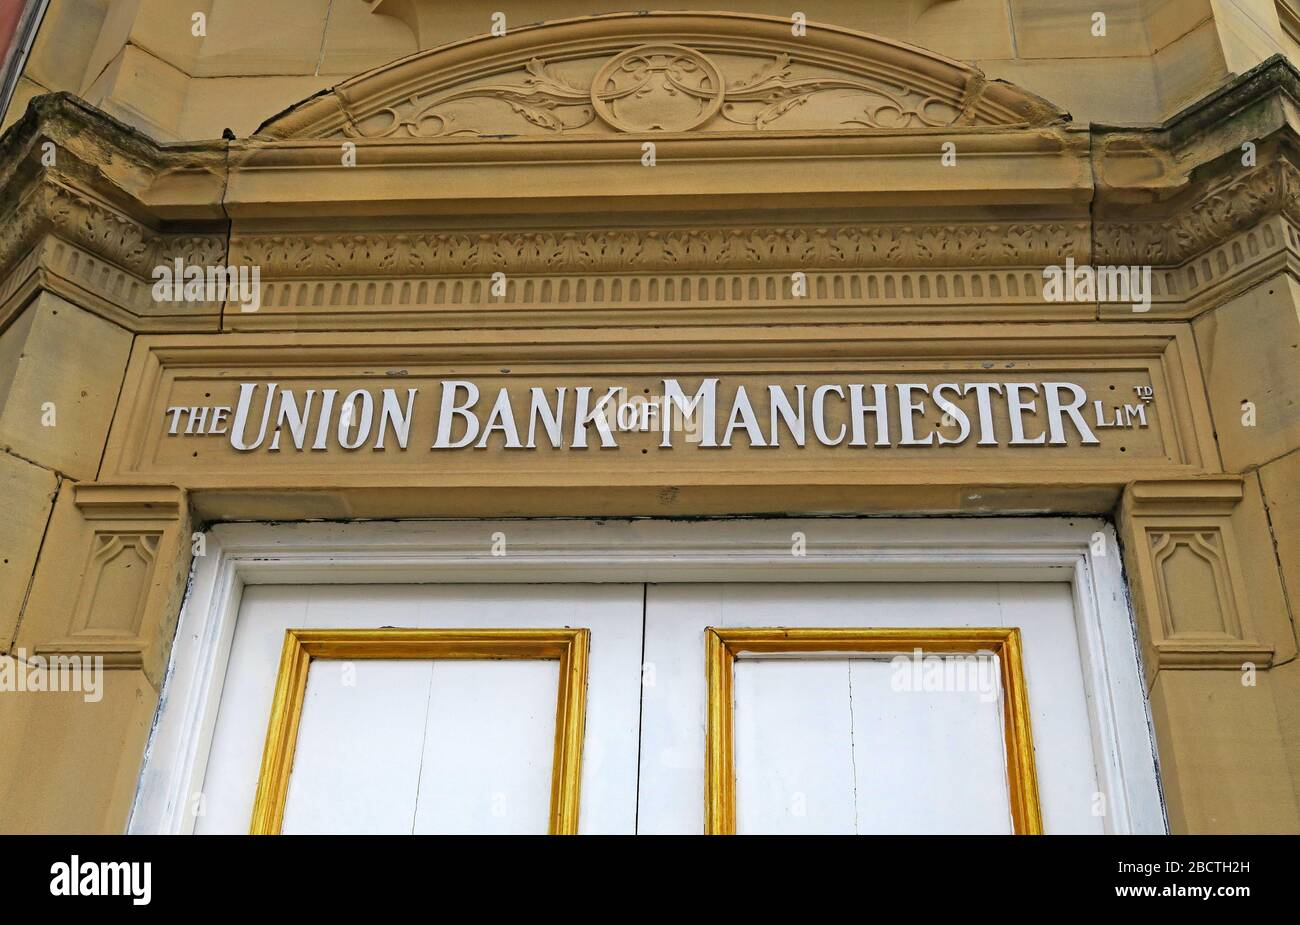 HotpixUK,@HotpixUk,GoTonySmith,Greater Manchester,Manchester,Cheshire,England,UK,town,history,historic,architecture,building,affiliated bank,door,doorway,exterior